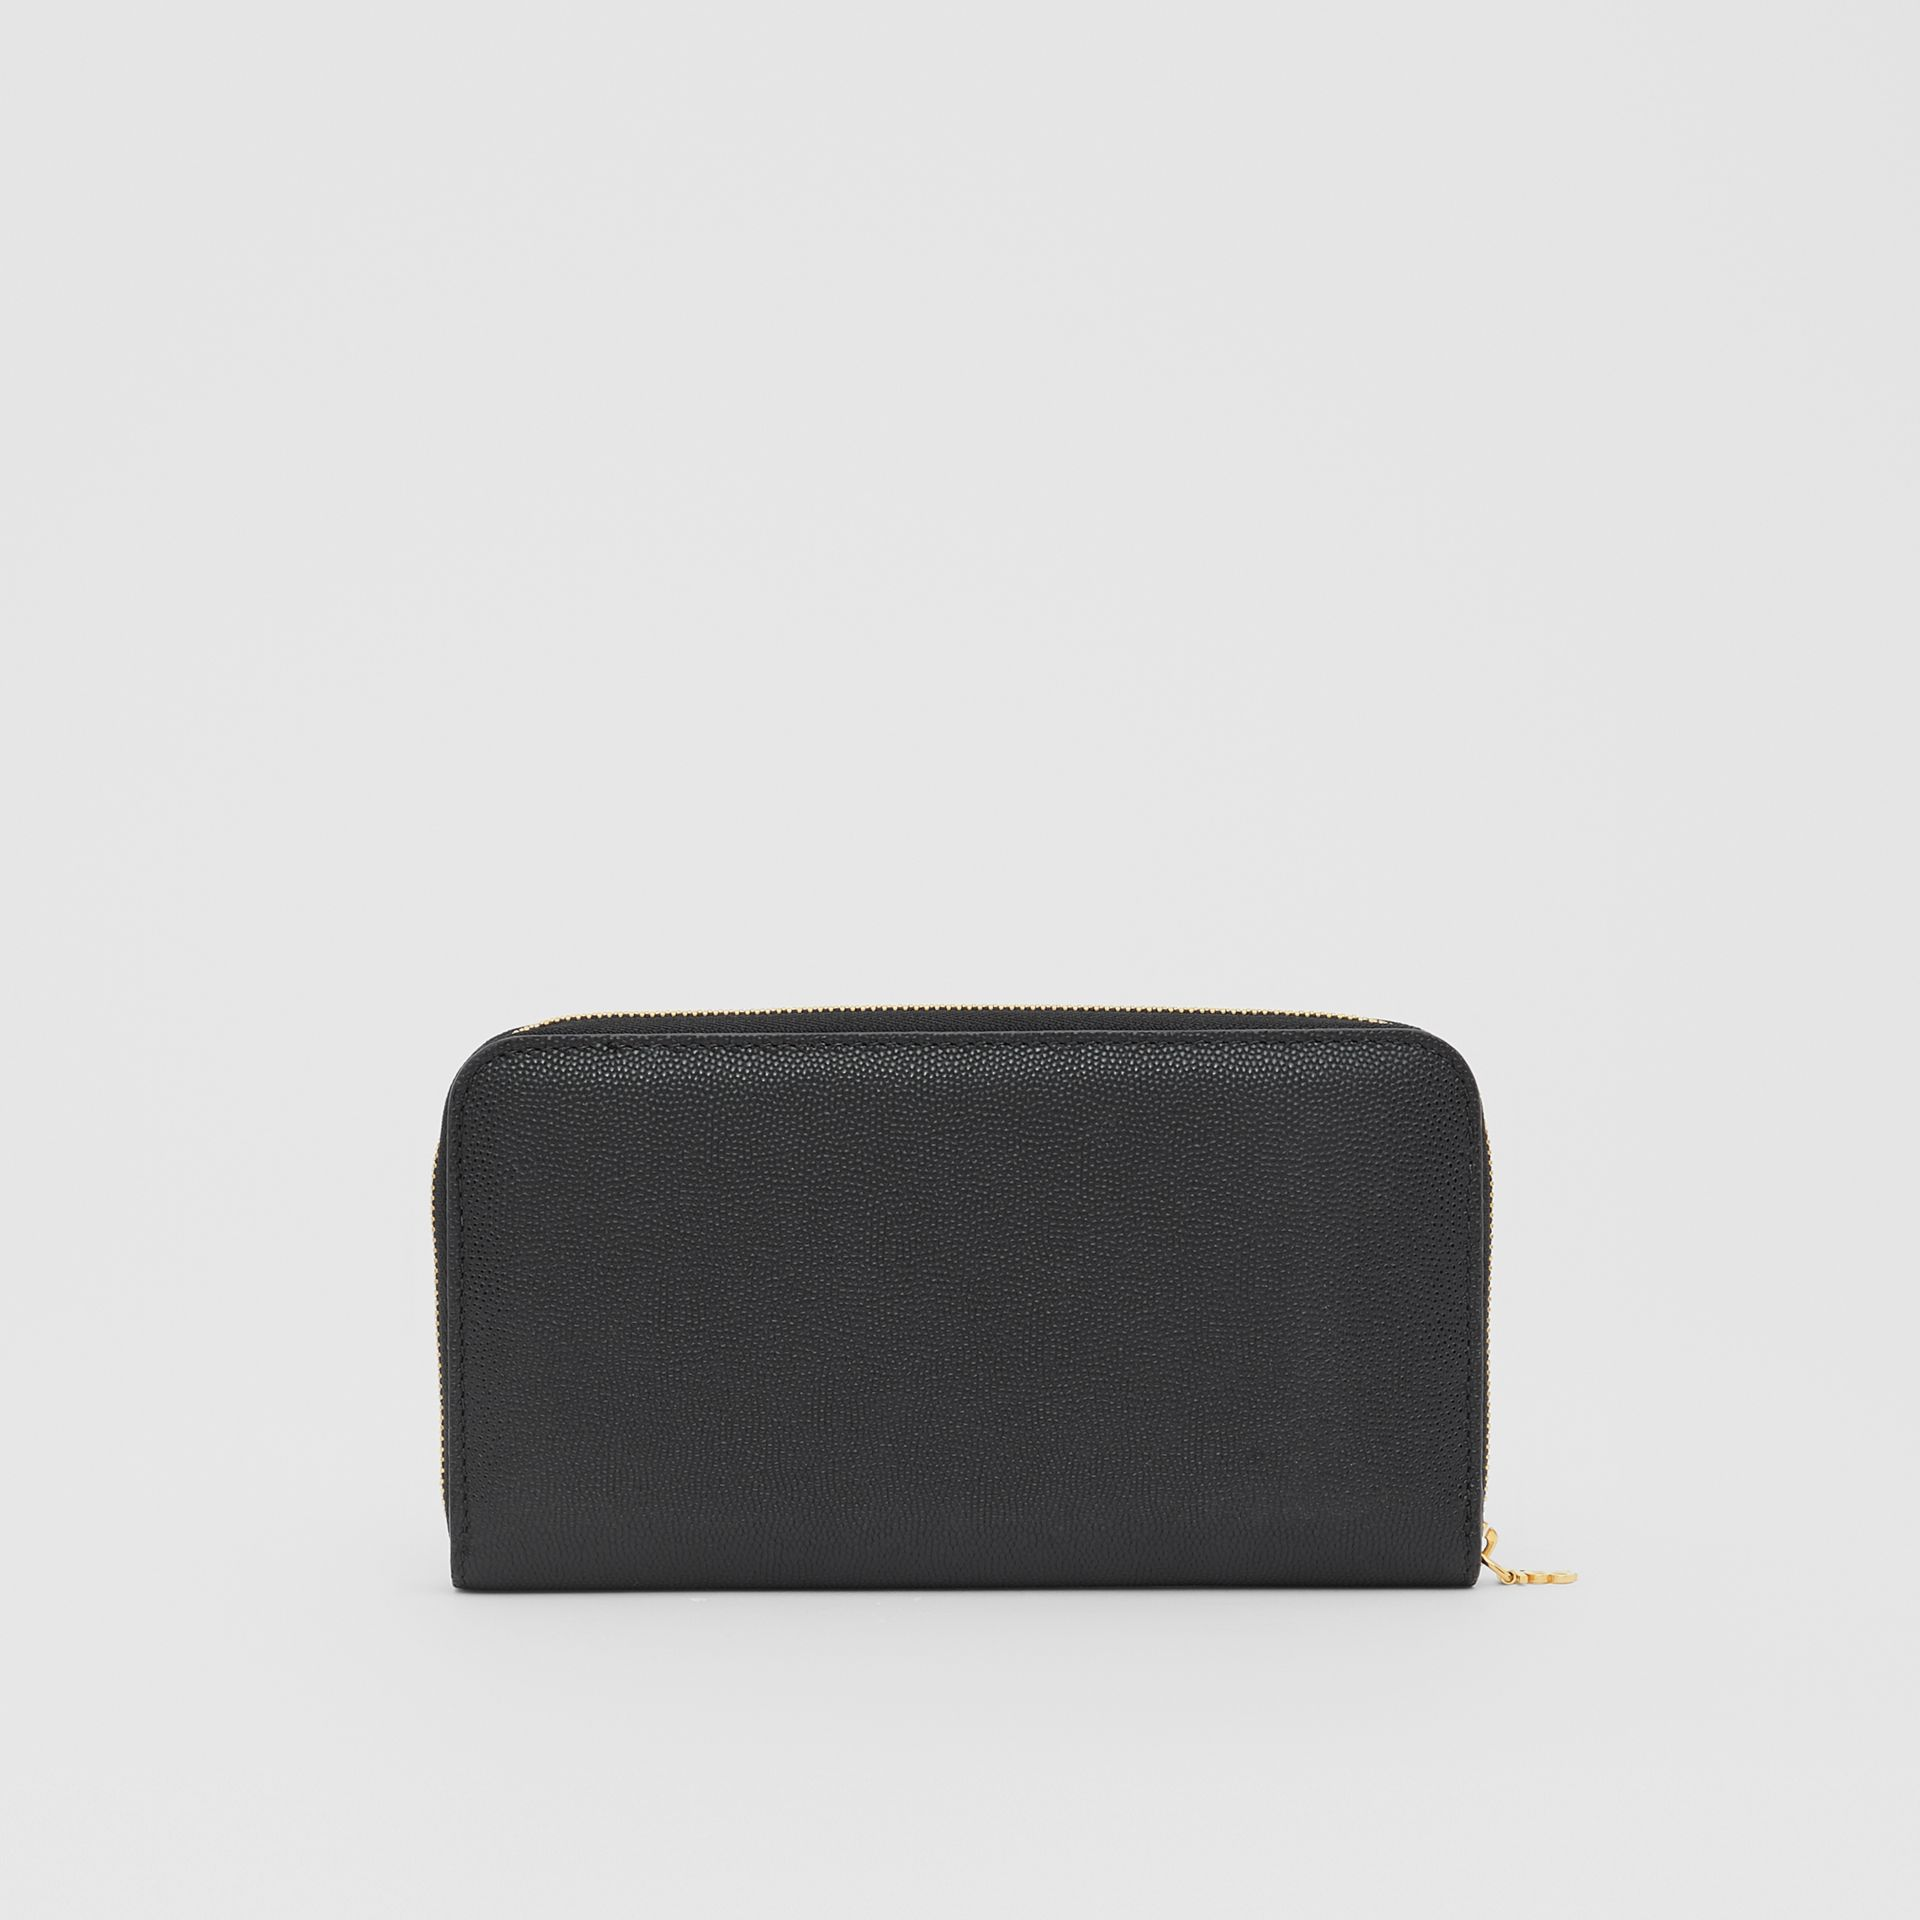 Monogram Motif Grainy Leather Ziparound Wallet in Black - Women | Burberry Australia - gallery image 5